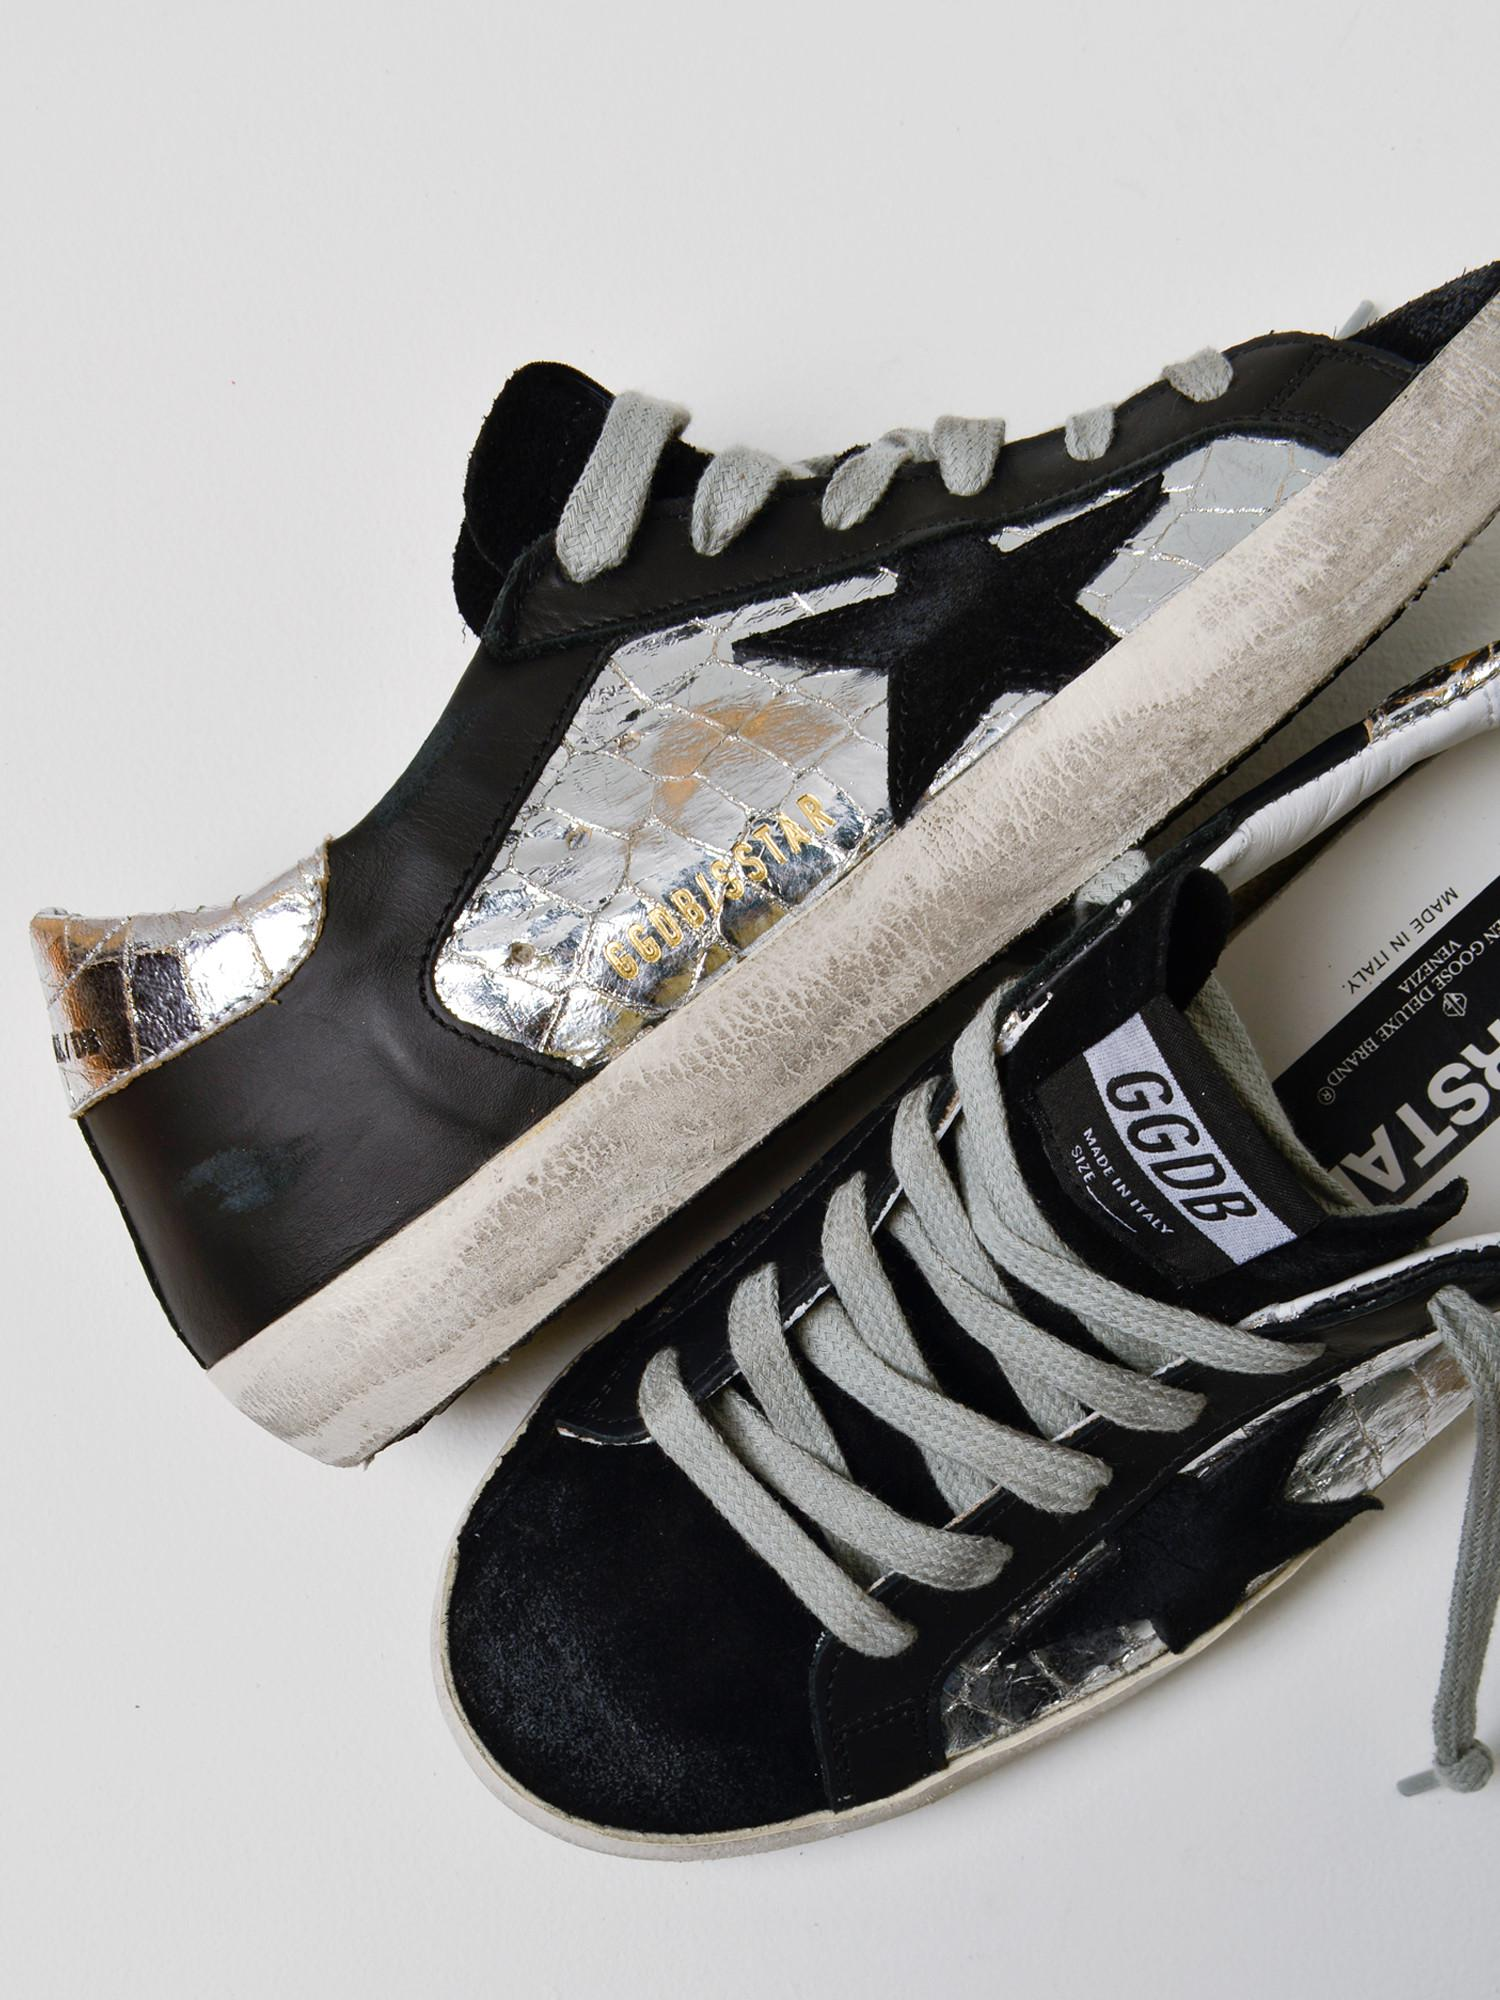 c1cca08997cb Golden Goose Deluxe Brand - Sneakers Superstar silver Cocco Black Star for  Men - Lyst. View fullscreen